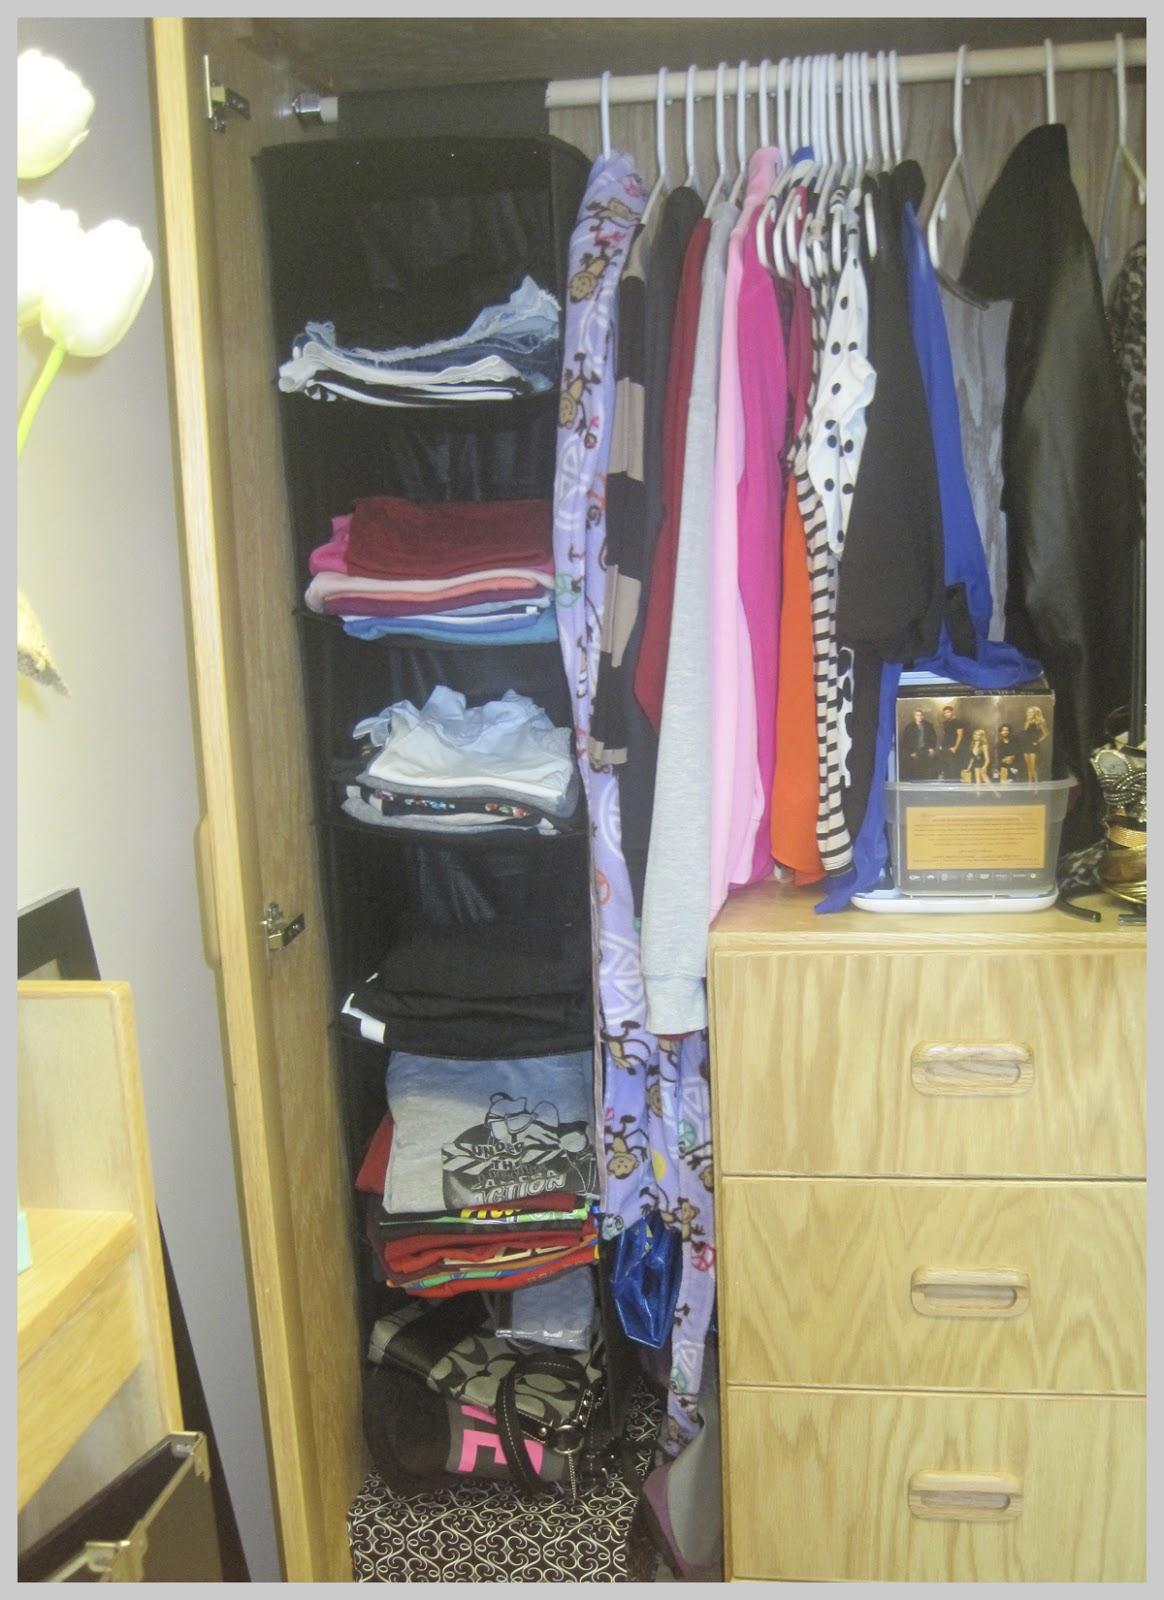 Dorm Room Closet: Fashionably College: Dorm Room Organization